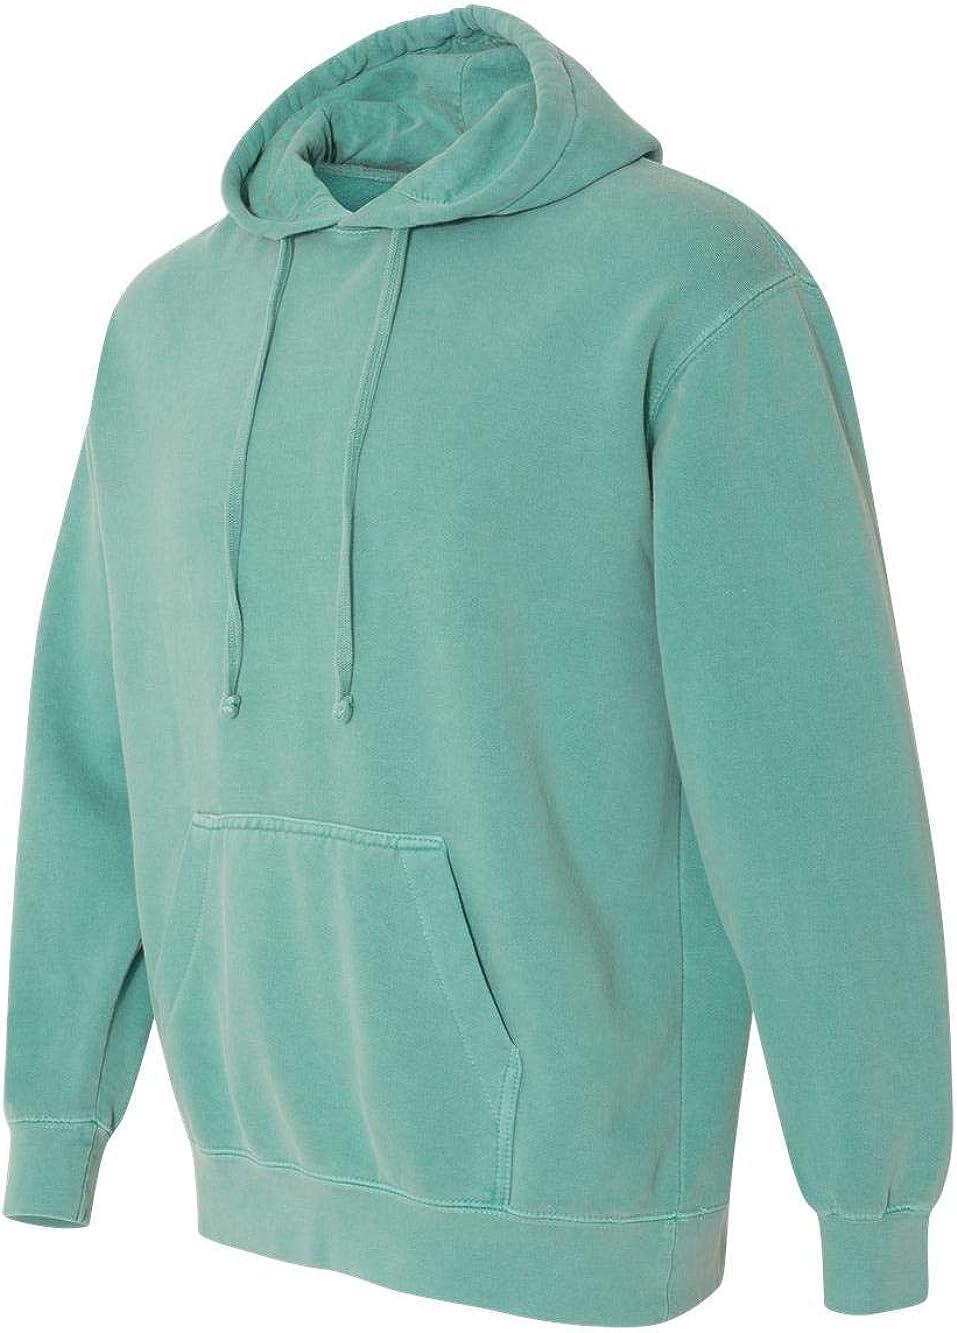 Comfort Colors - Garment-Dyed Hooded Sweatshirt - 1567 - 3XL - Seafoam